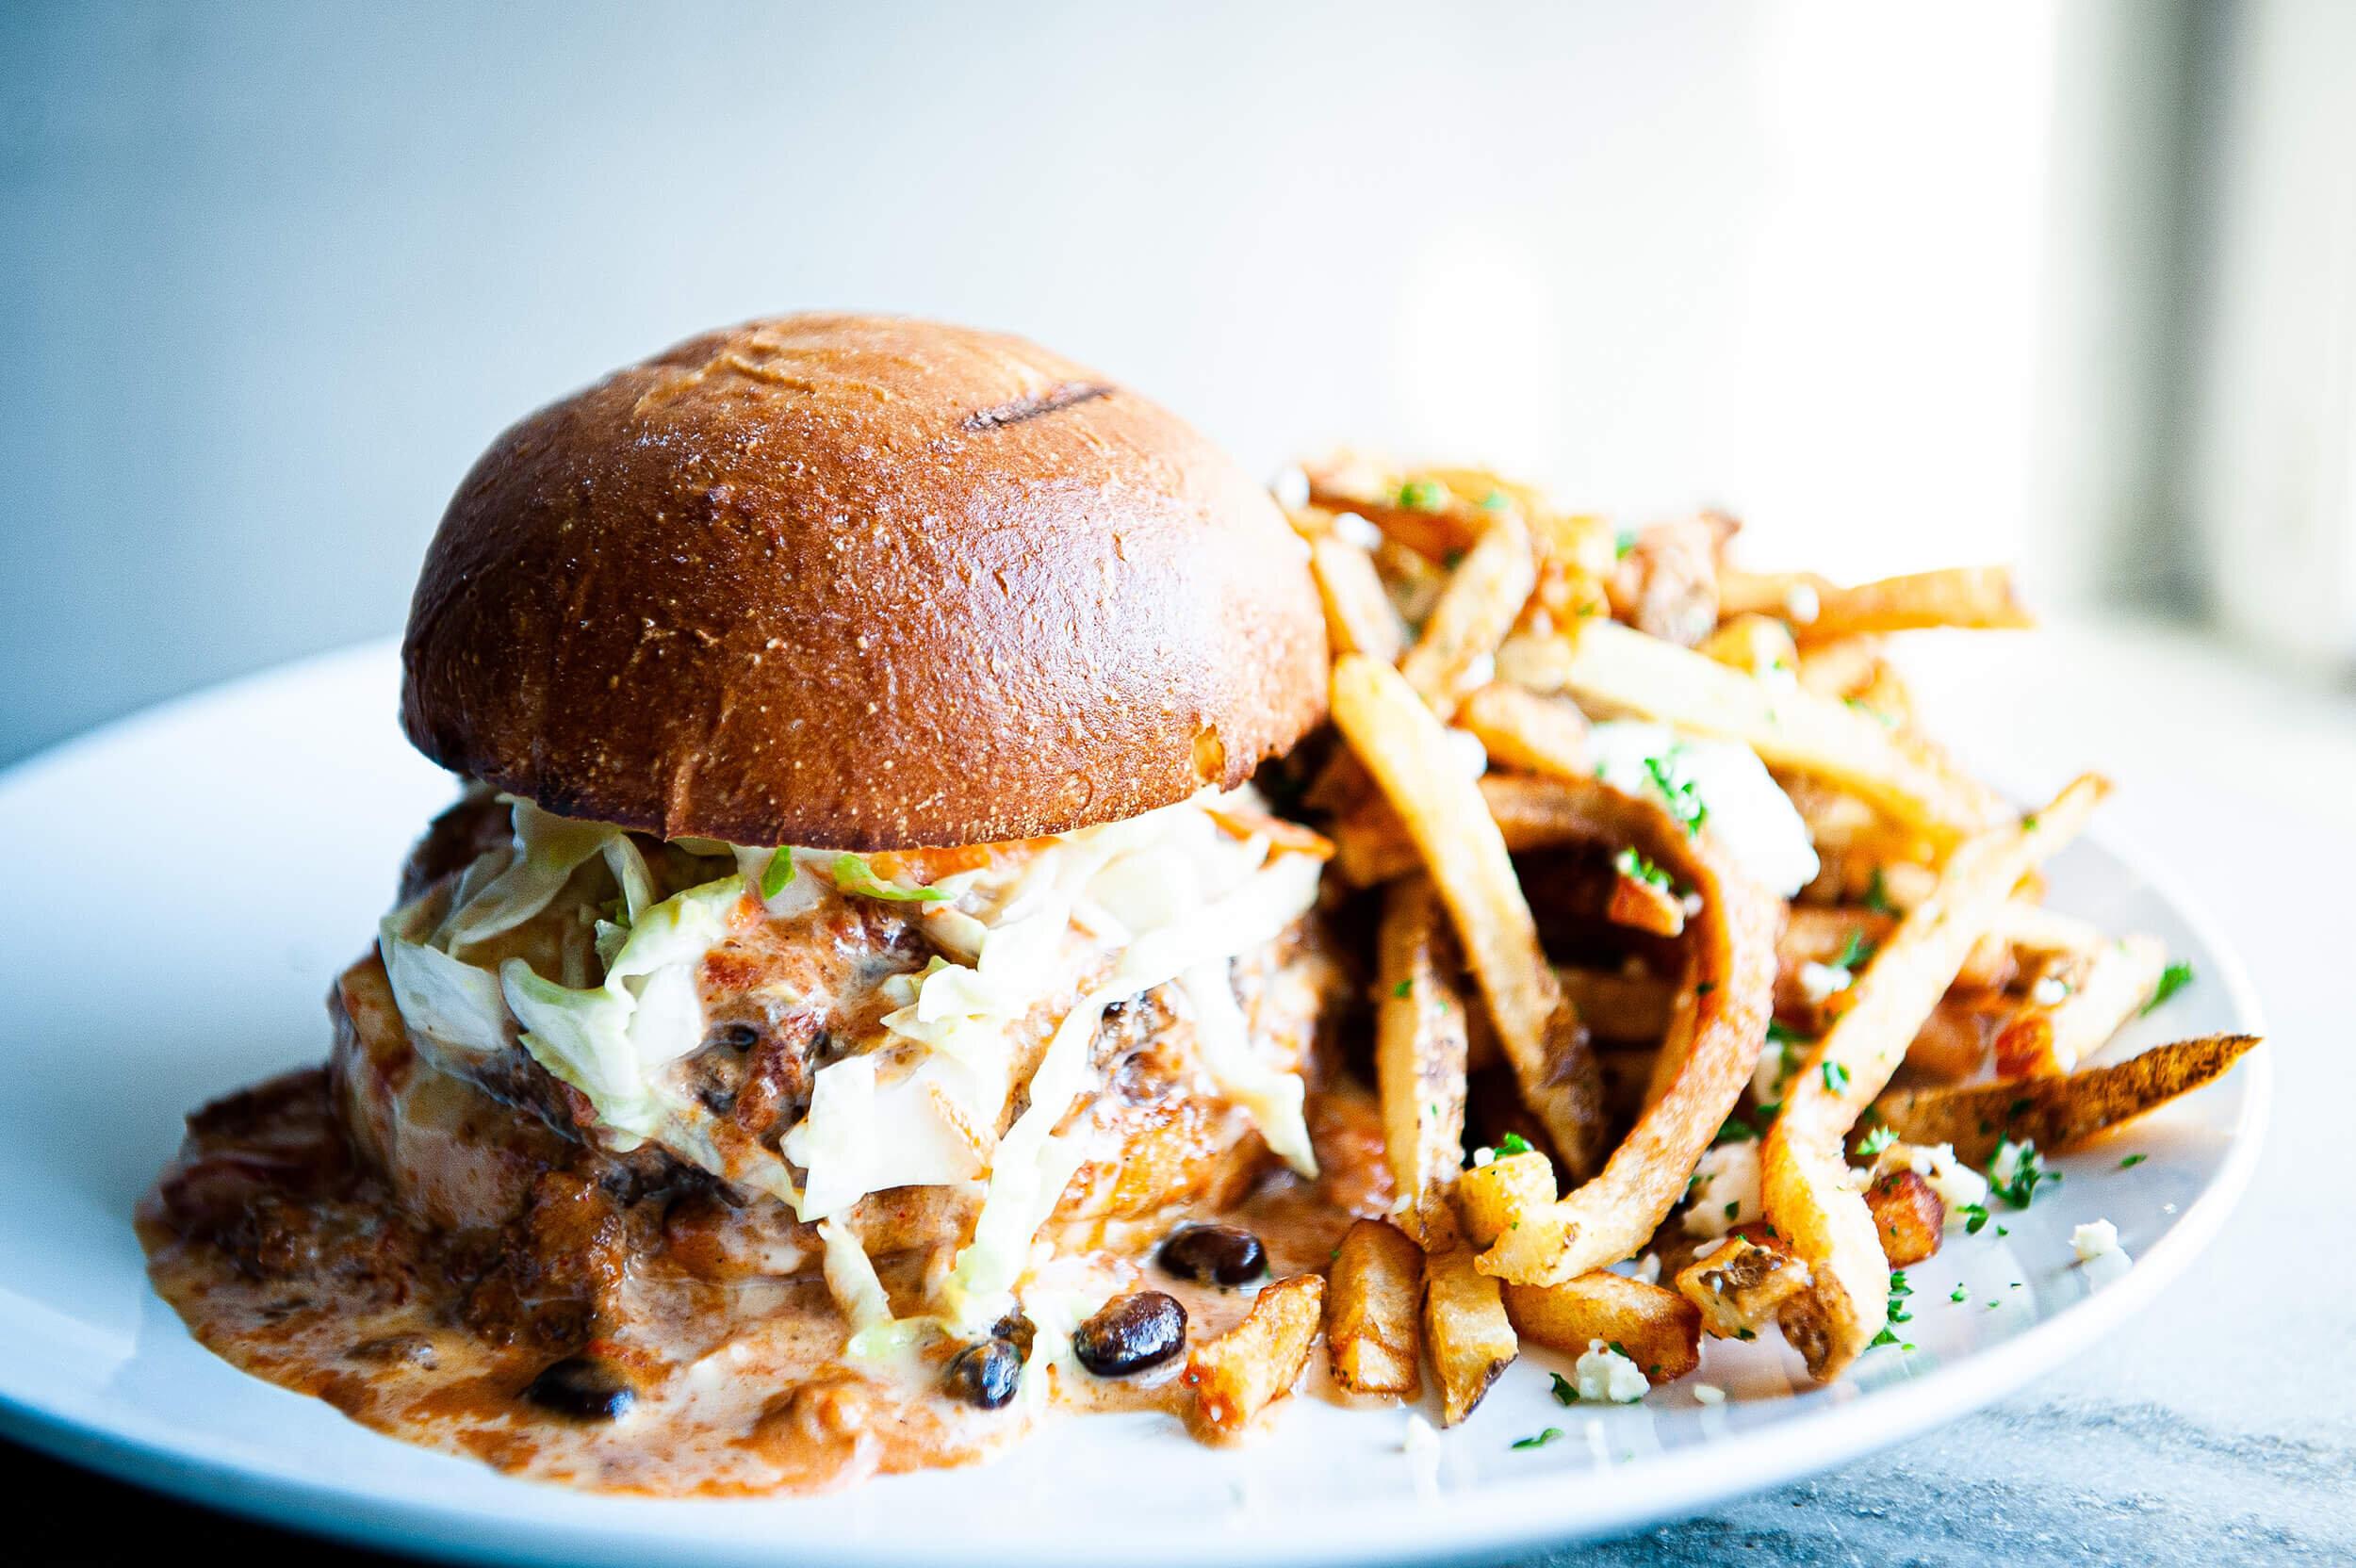 shire-breu-hous-food-chili-burger.jpg